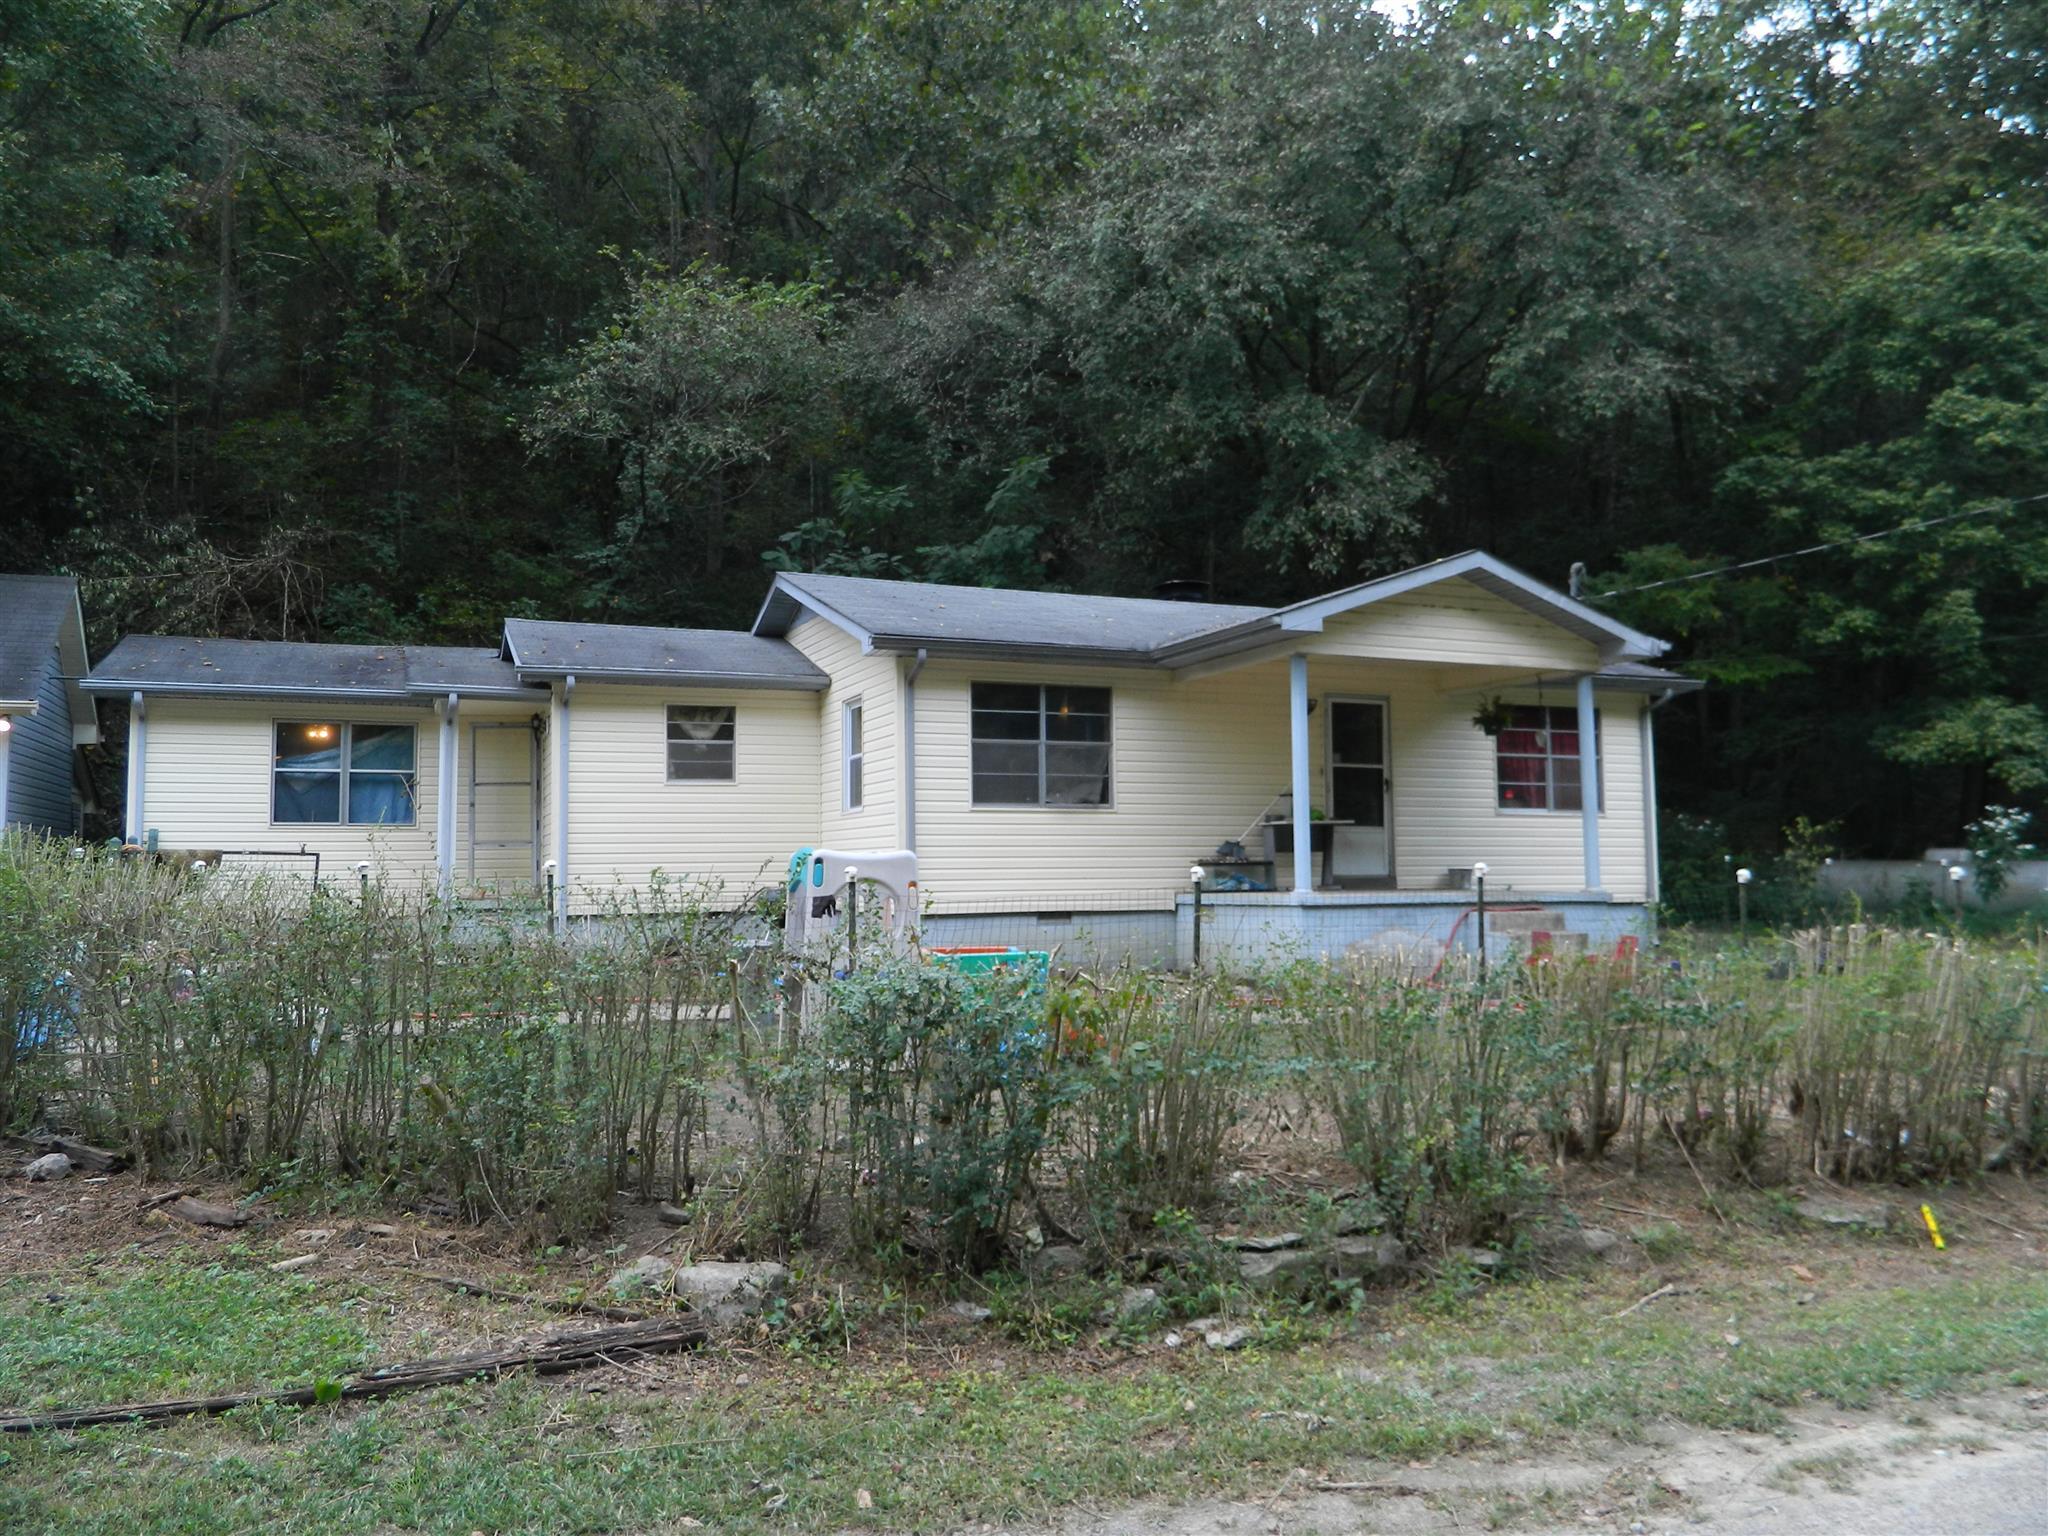 212 Melton Hollow Rd, Liberty, TN 37095 - Liberty, TN real estate listing